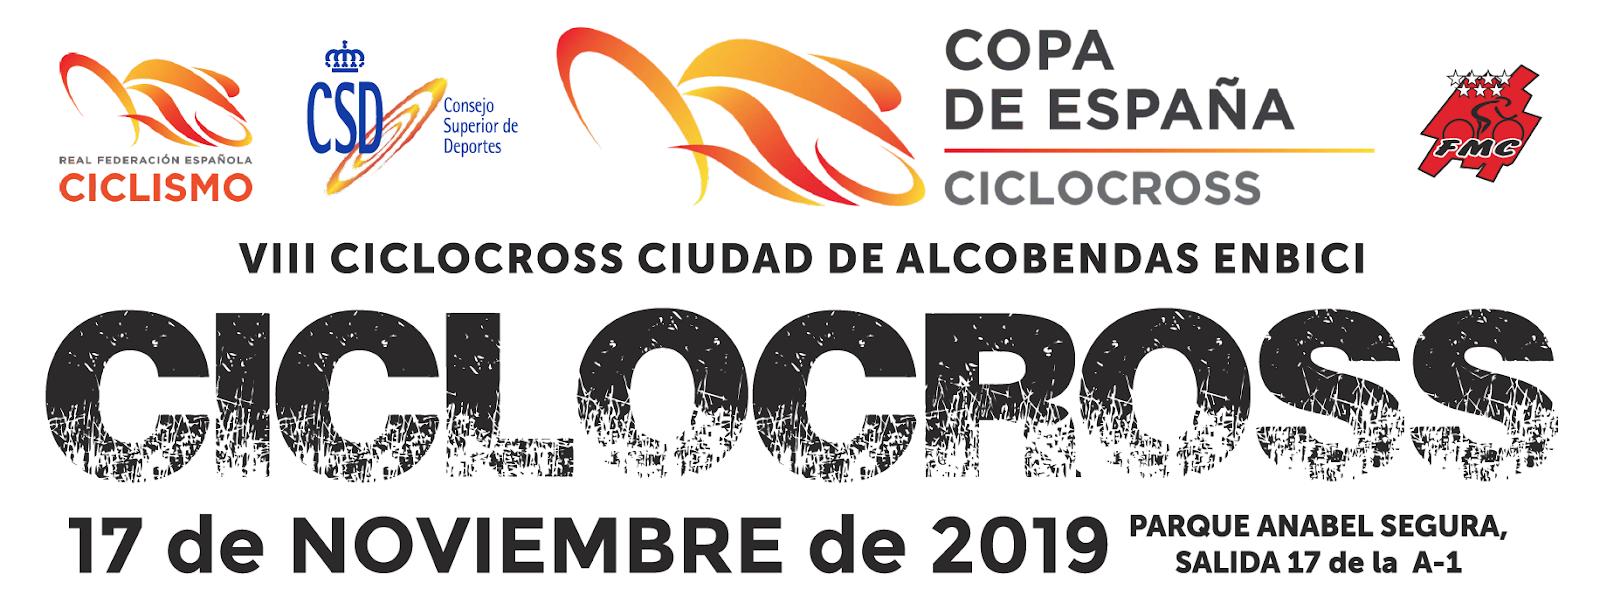 Ciclocross Alcobendas